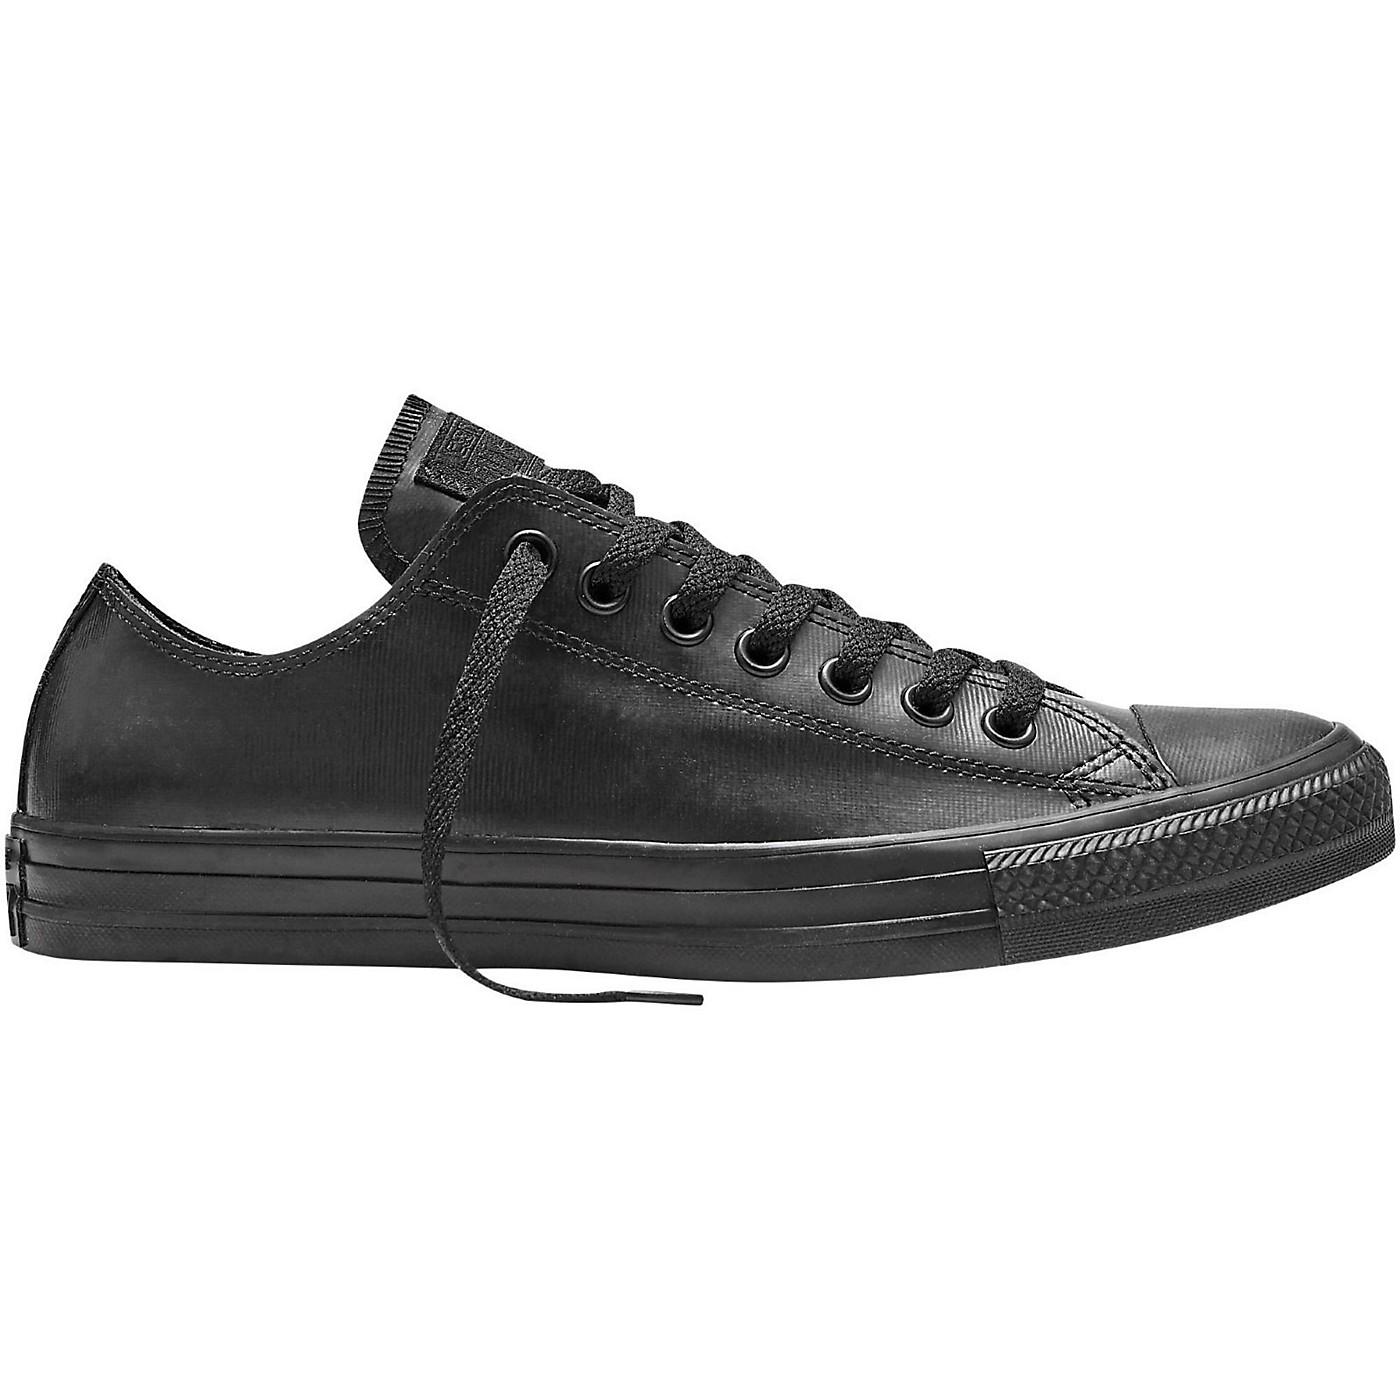 Converse All Star Rubber Black/Black/Black (Men's) Regular thumbnail